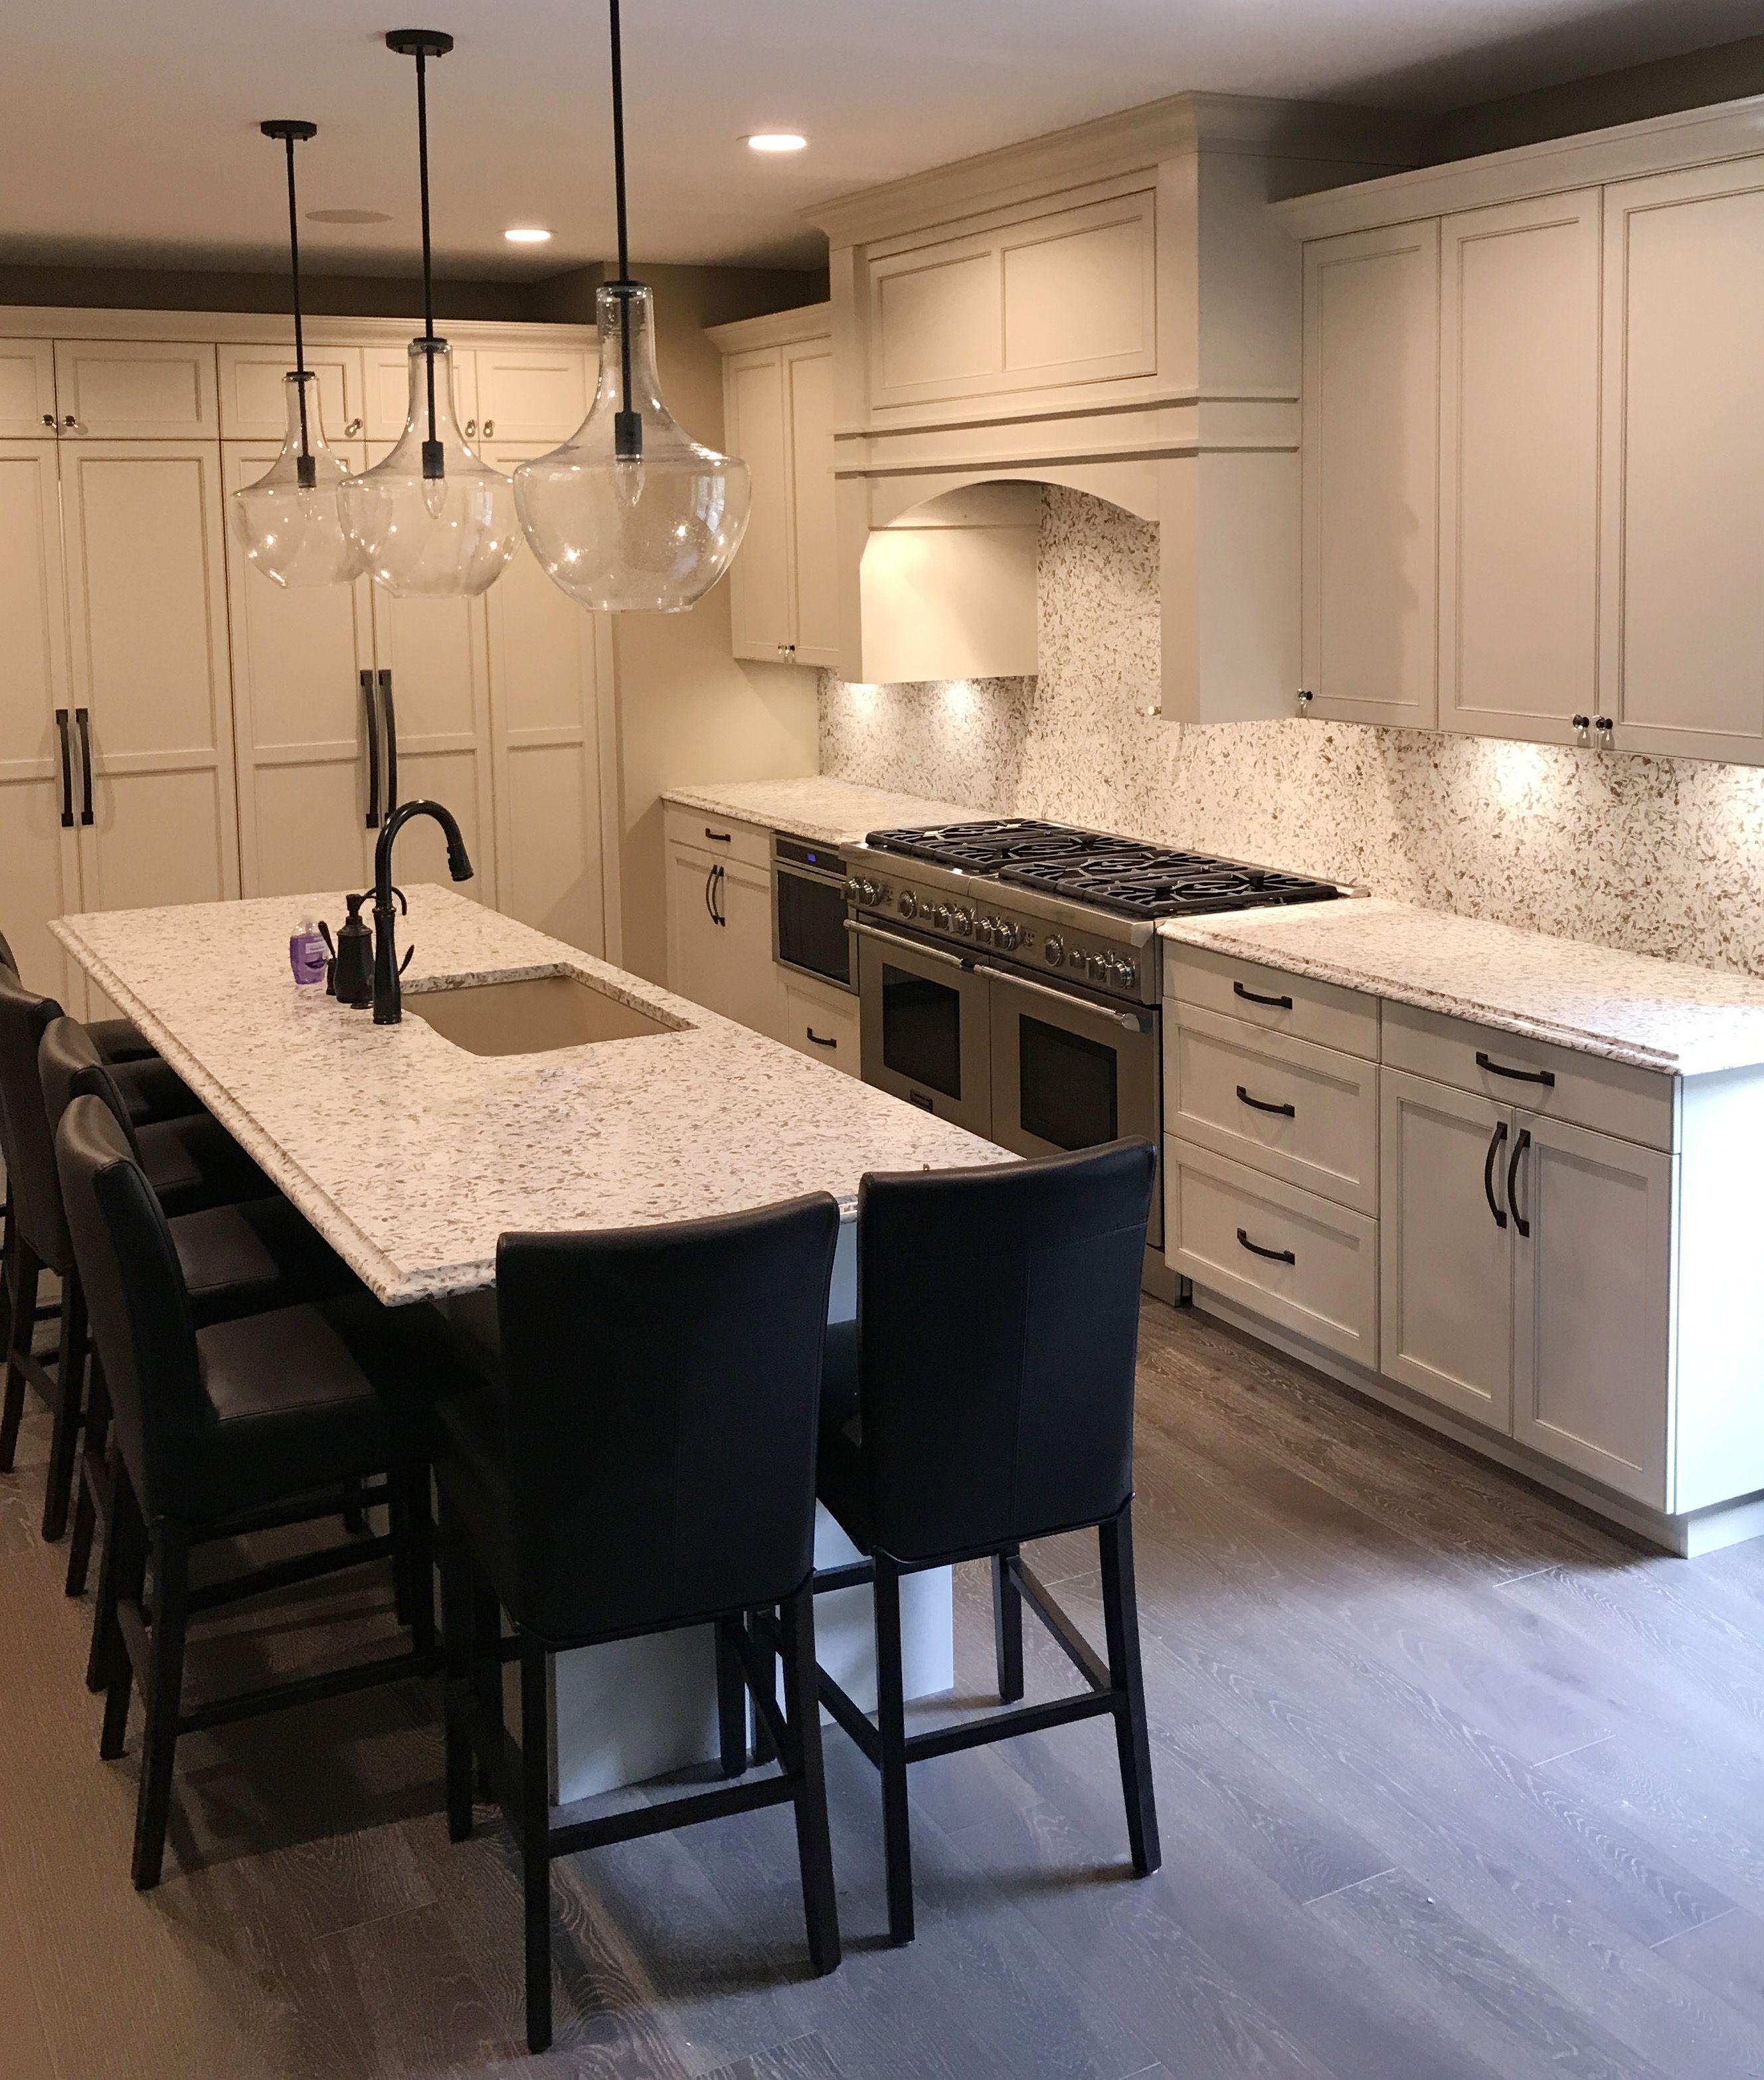 Kitchen Wall Tiles Height: ColorQuartz Siberian White Quartz Kitchen With Full Height